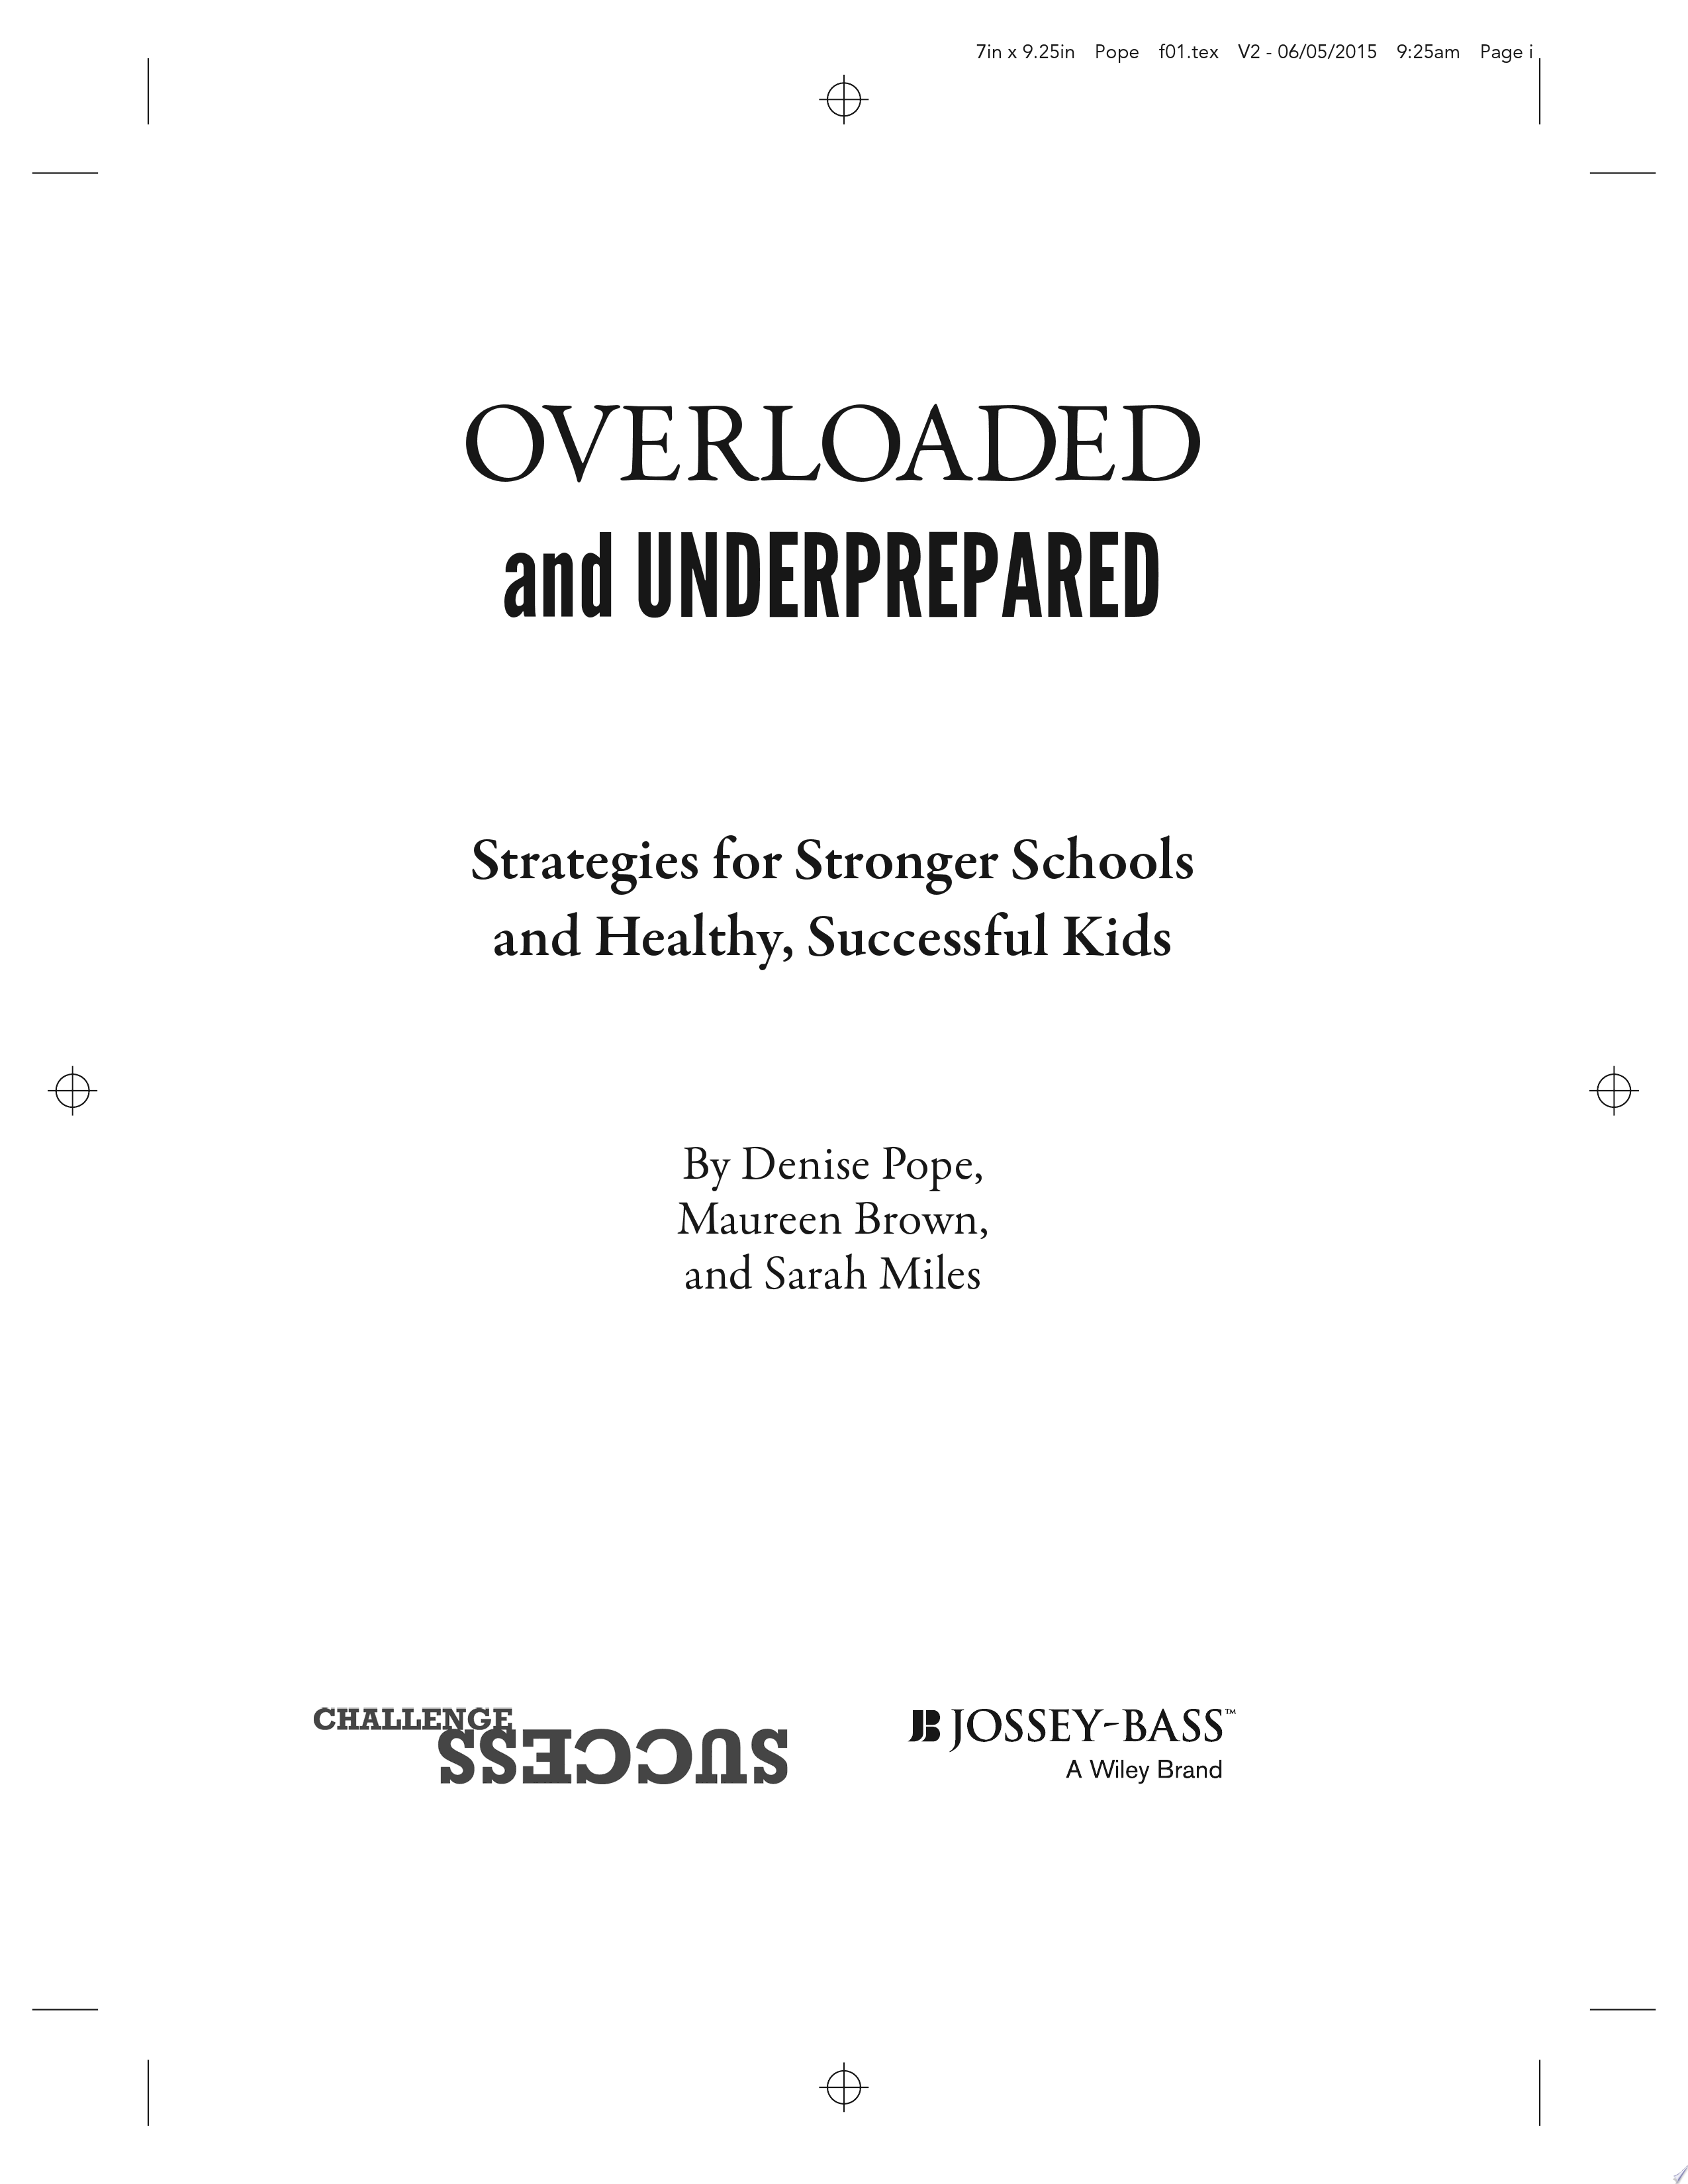 Overloaded and Underprepared